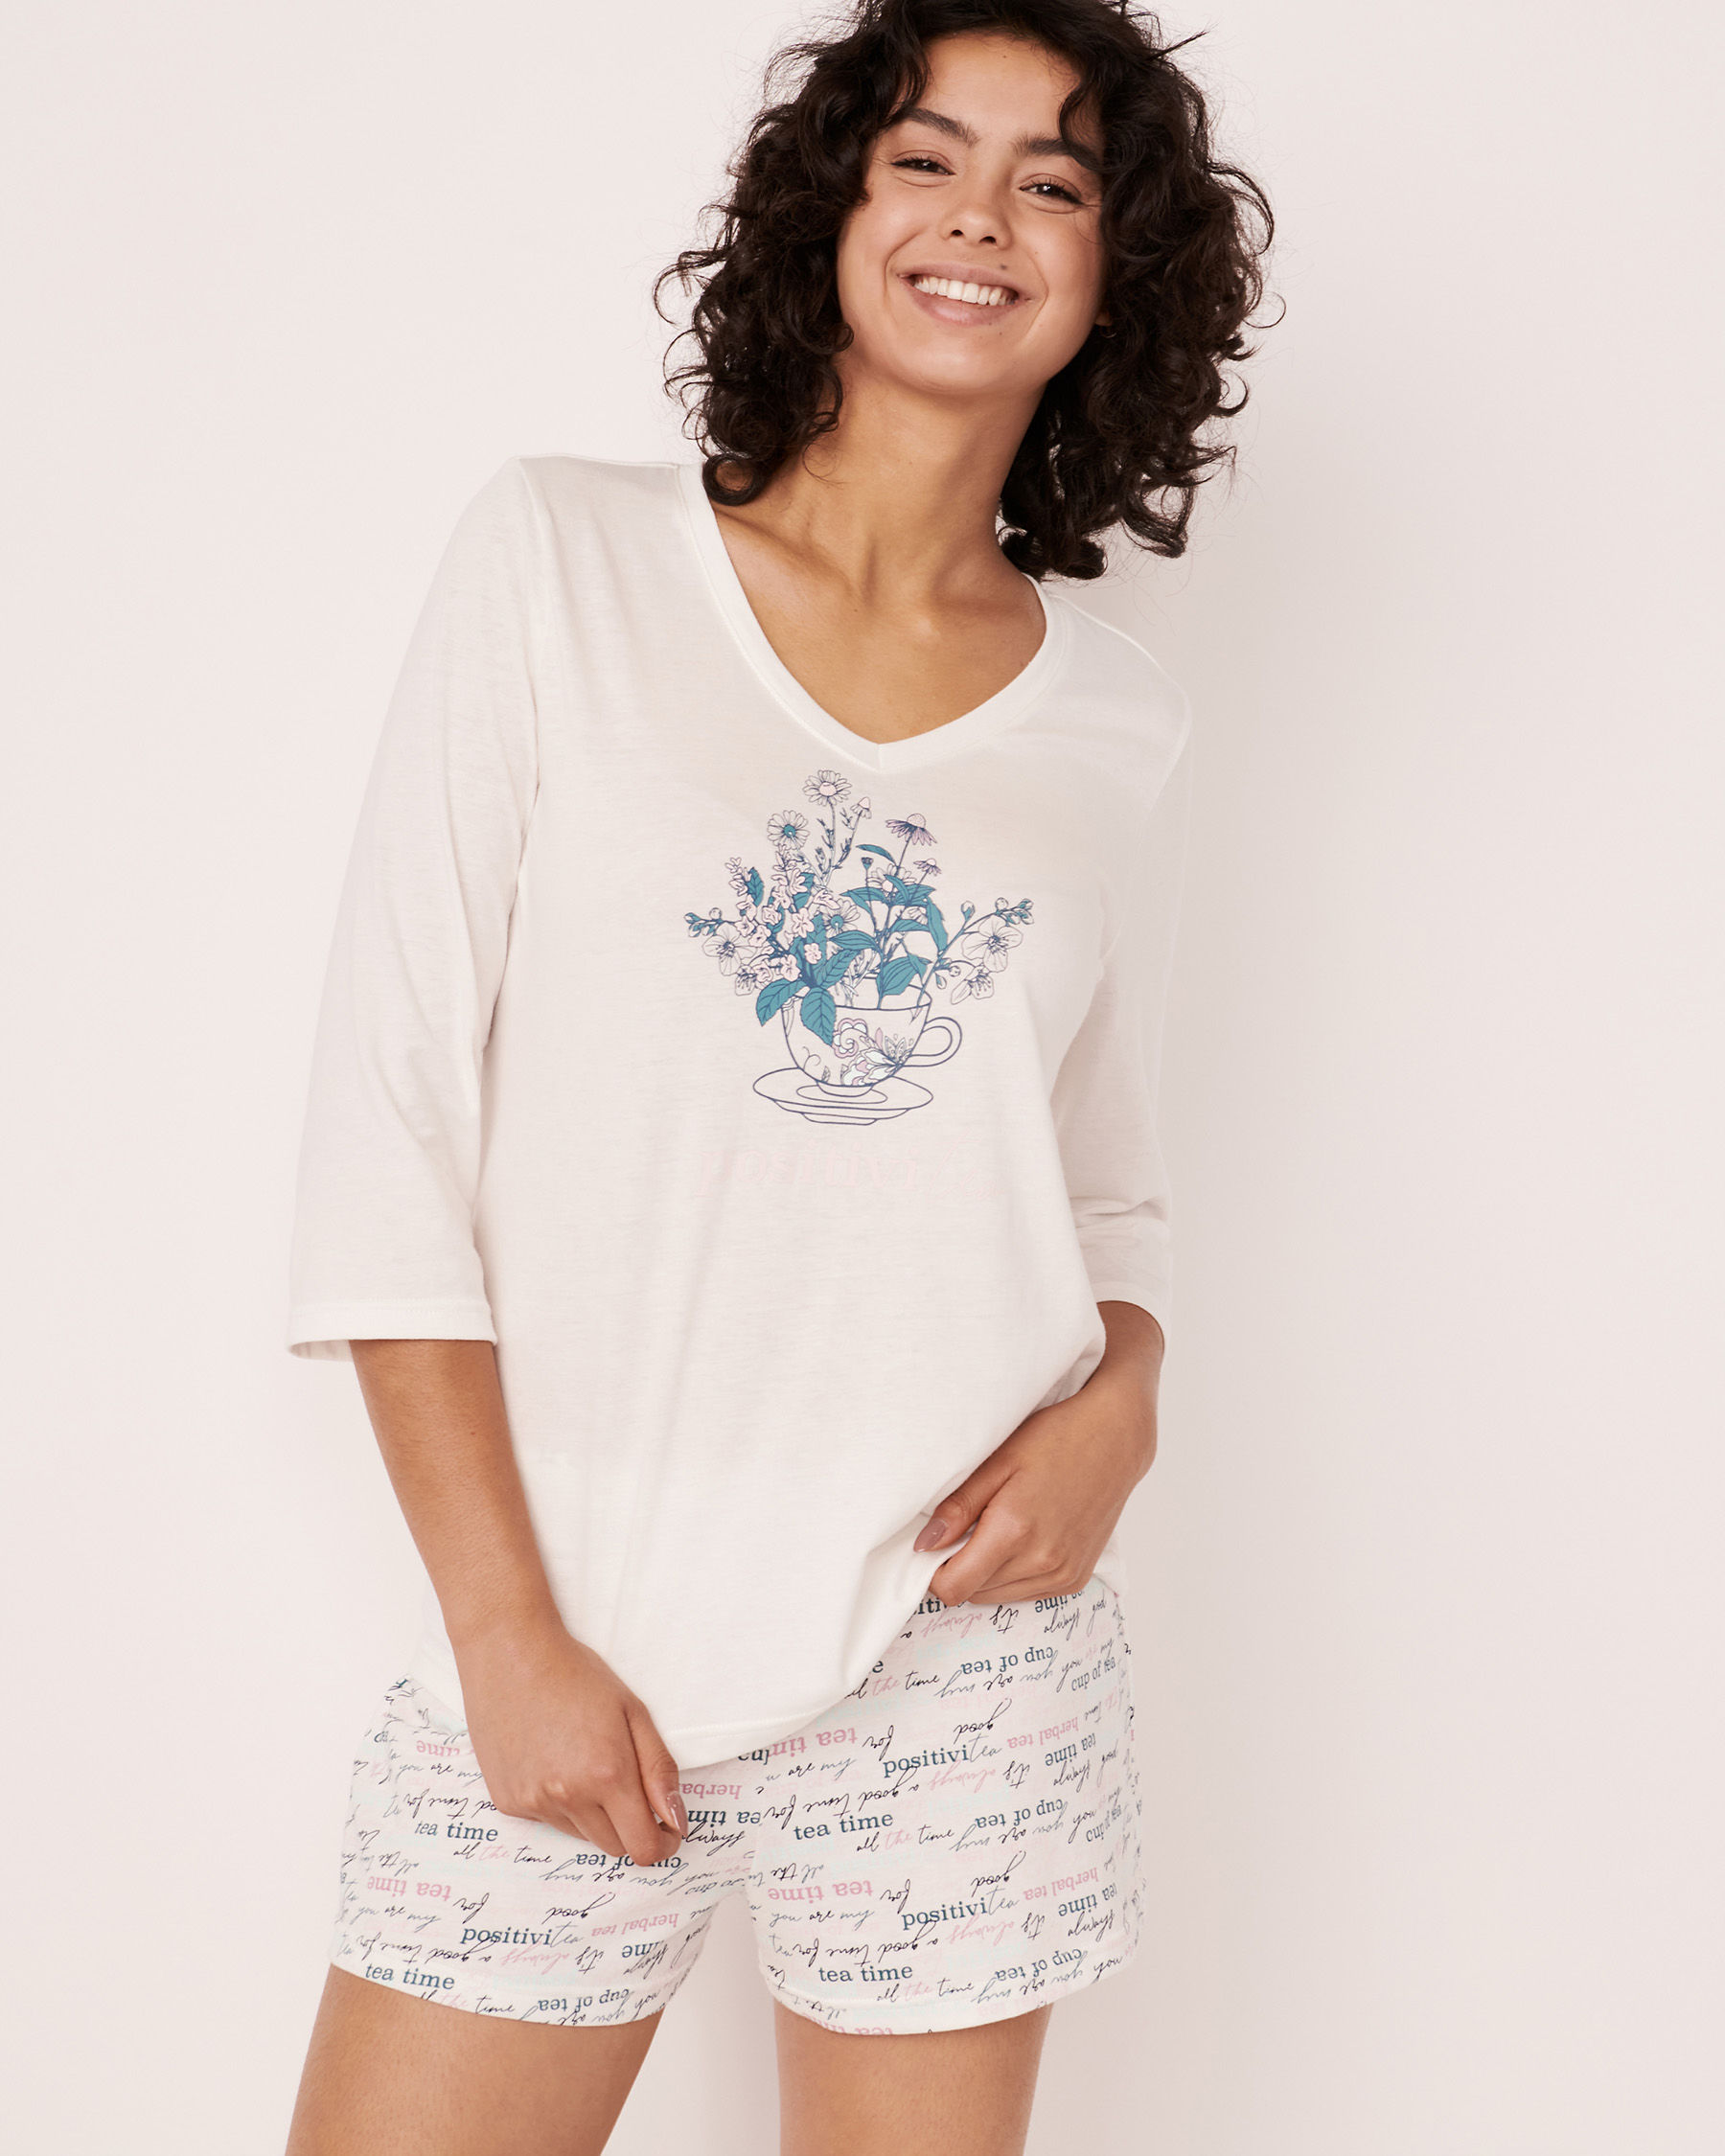 LA VIE EN ROSE V-neckline 3/4 Sleeve Shirt White 40100179 - View3